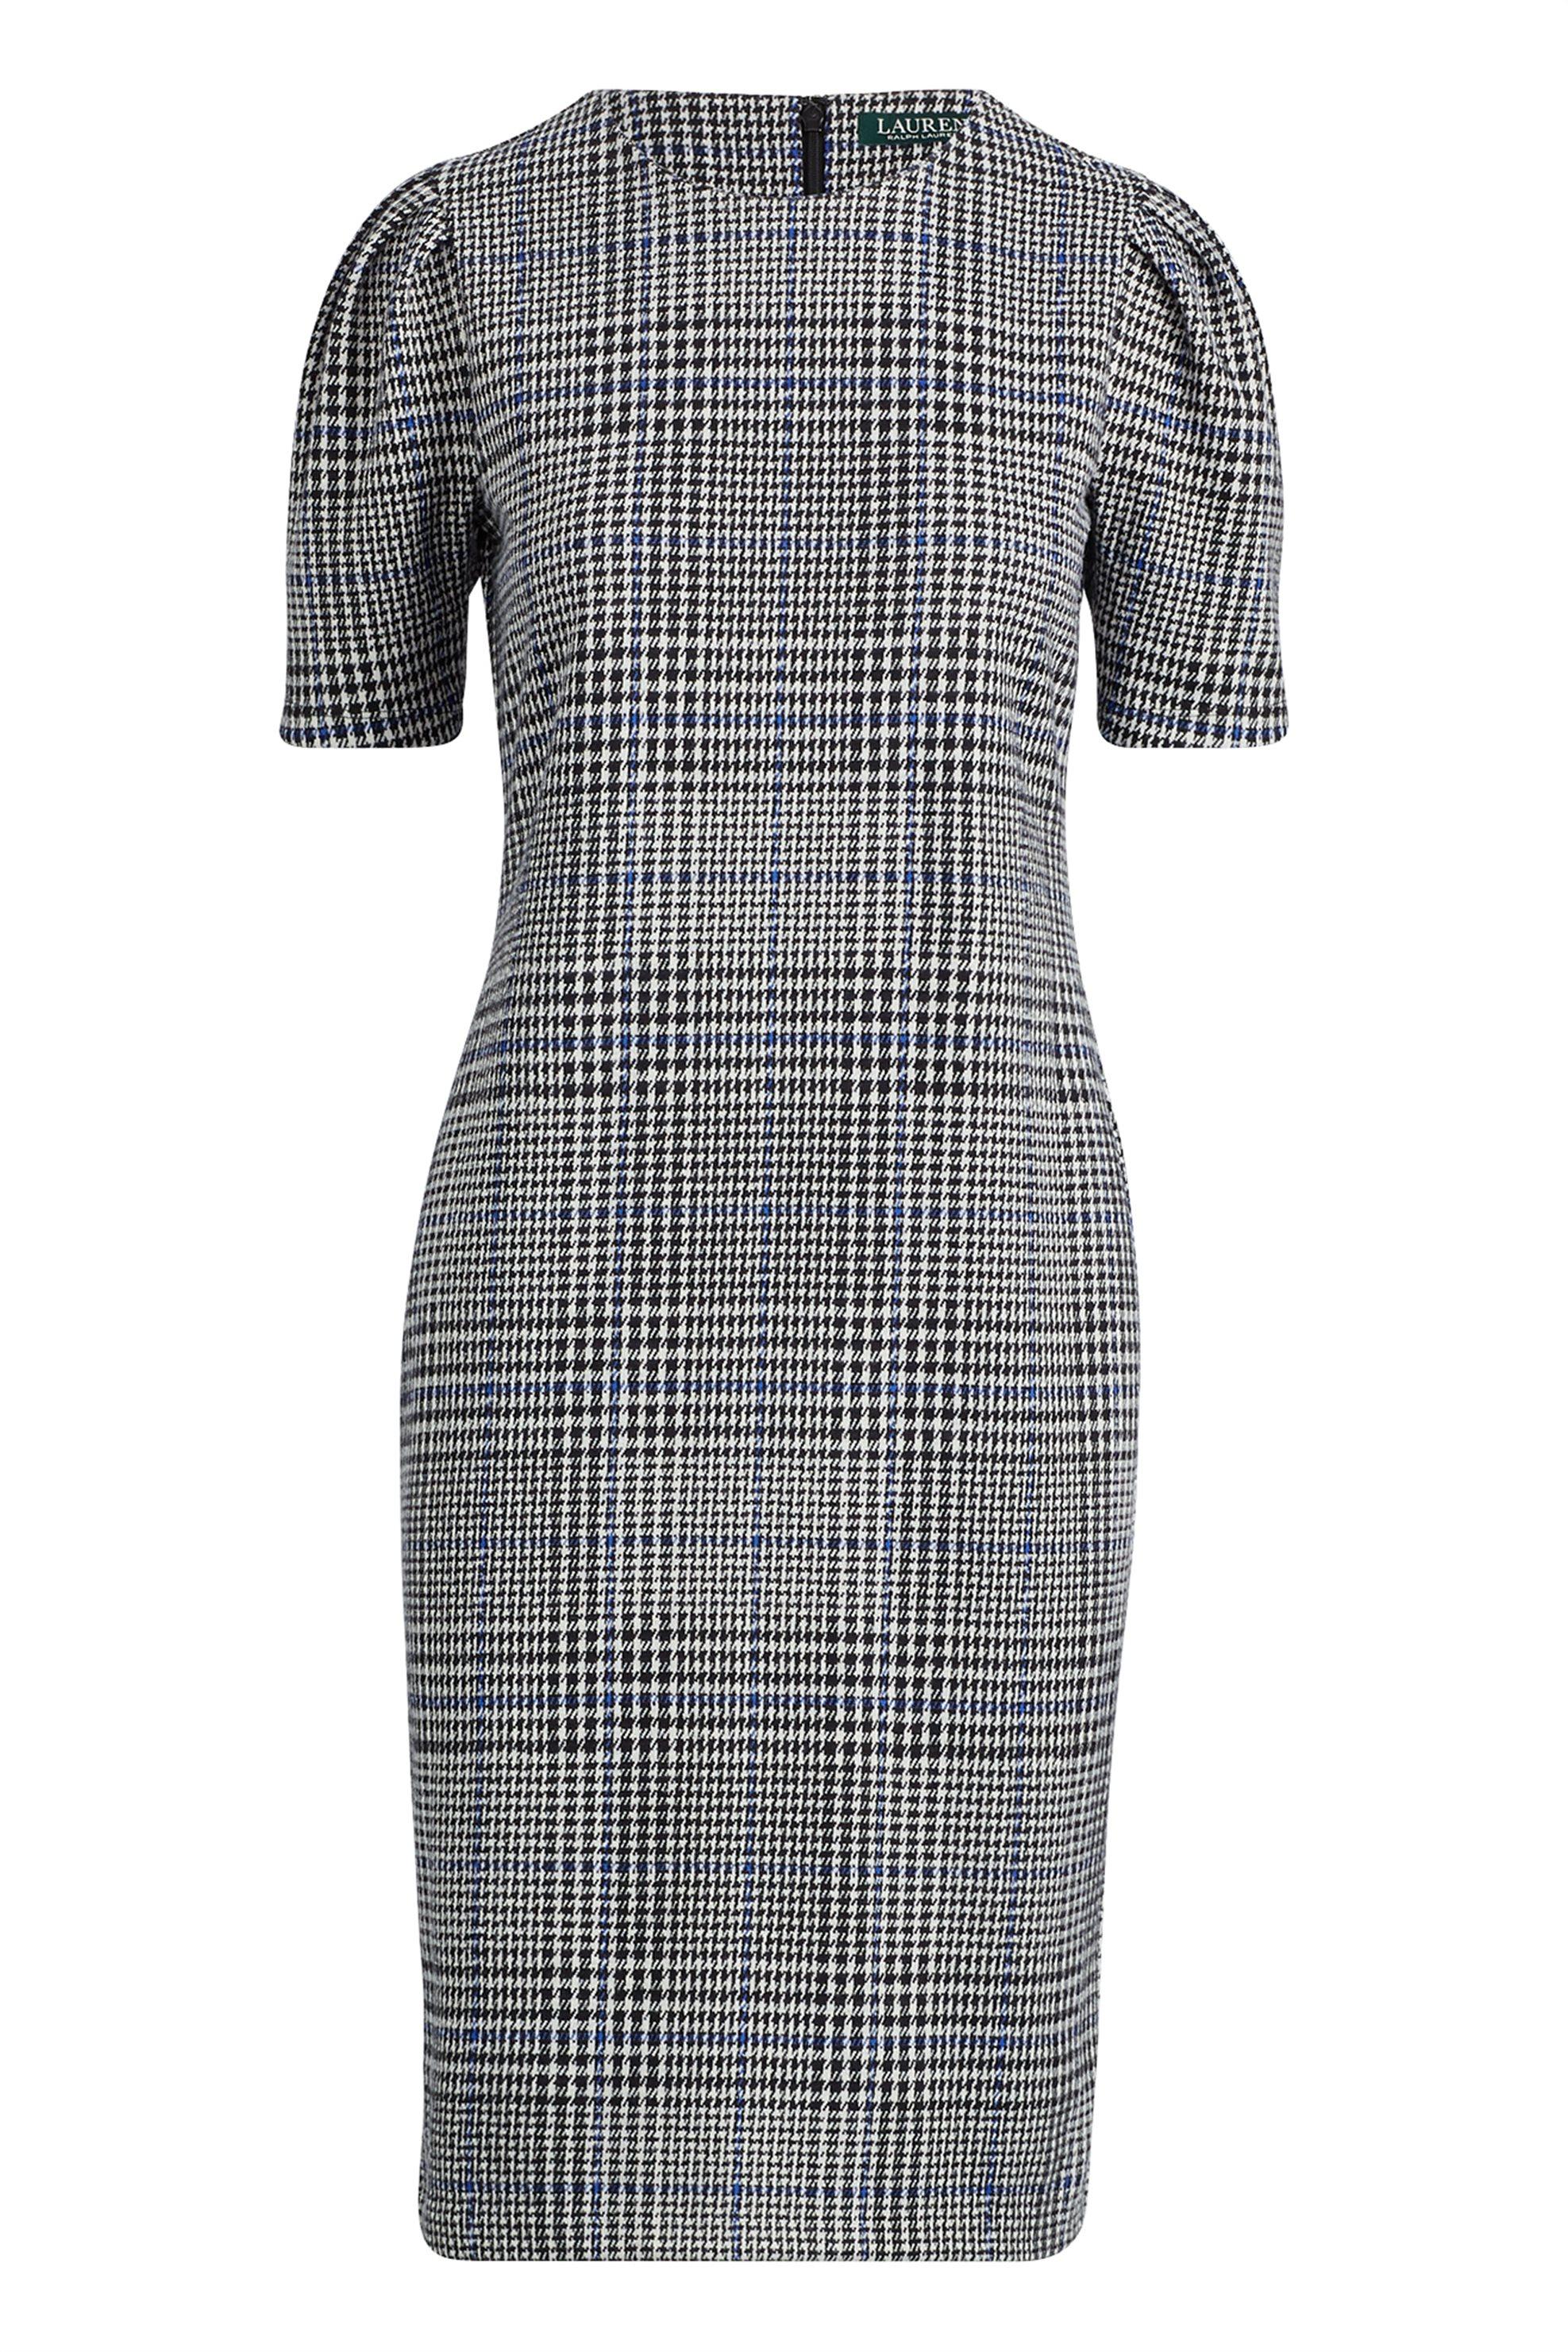 Lauren Ralph Lauren γυναικείo καρό φόρεμα με φουσκωτά μανίκια - 200726324001 - Γ γυναικα   ρουχα   φορέματα   mini φορέματα